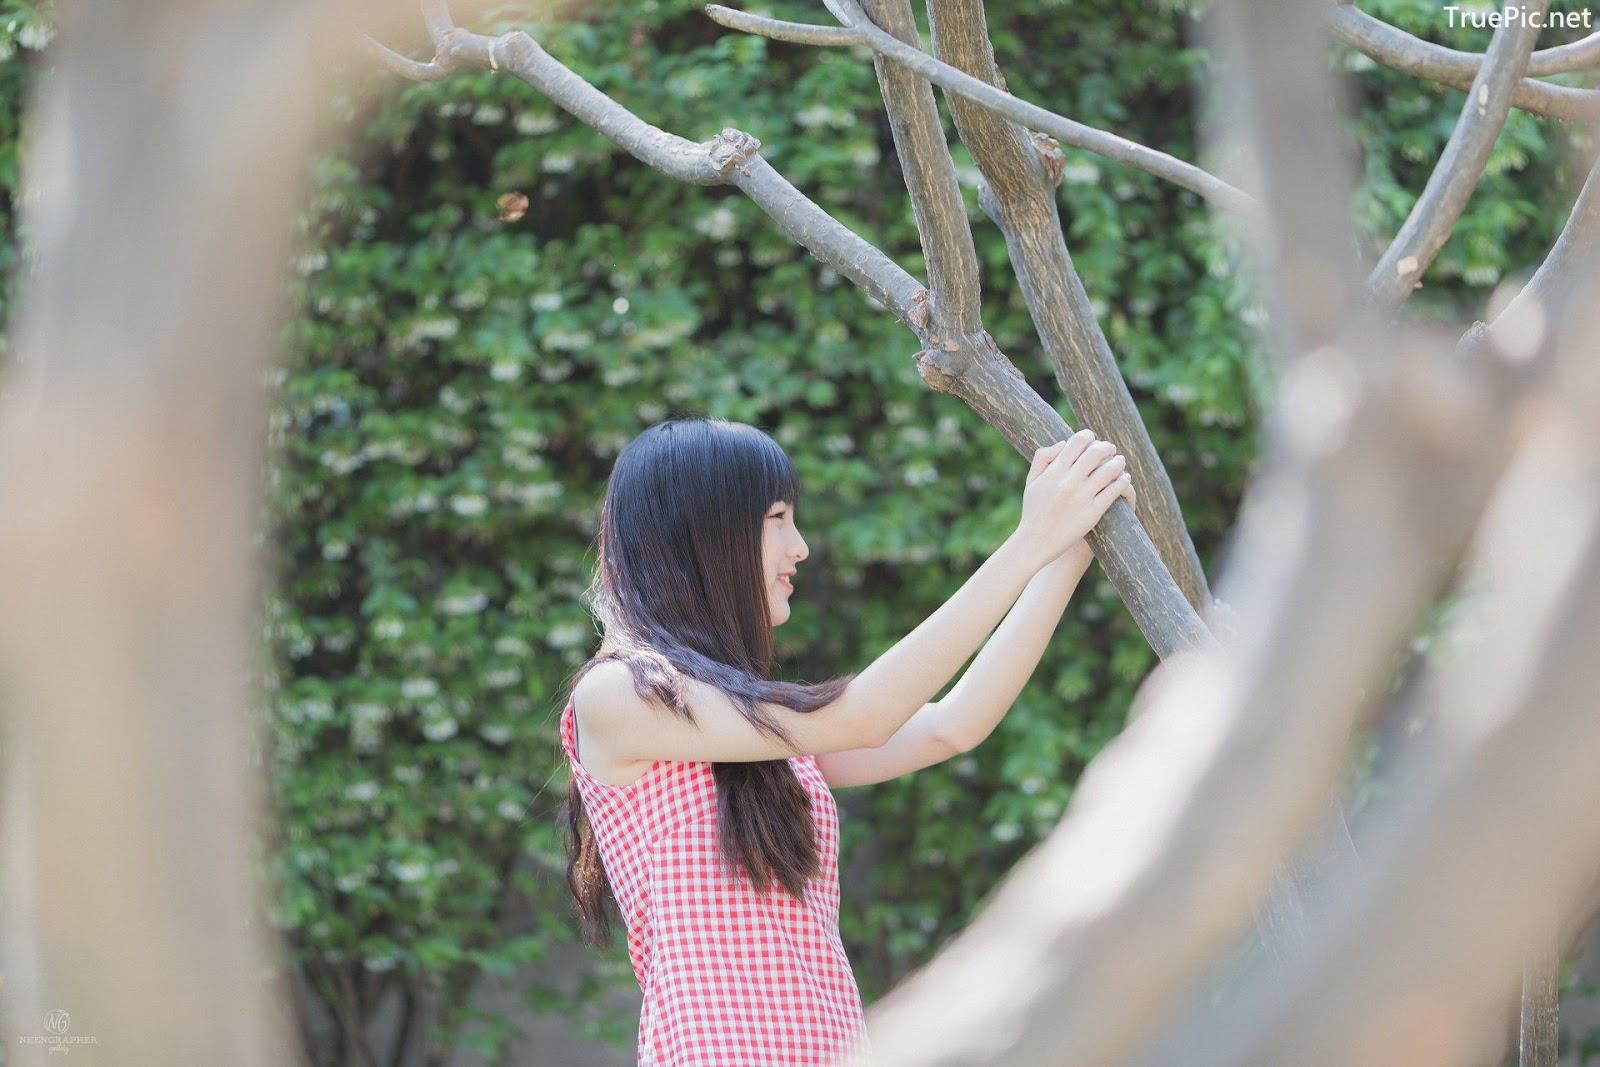 Image-Thailand-Cute-Model-Emma-Panisara–Album-Emma-Bright-Sunday-TruePic.net- Picture-19